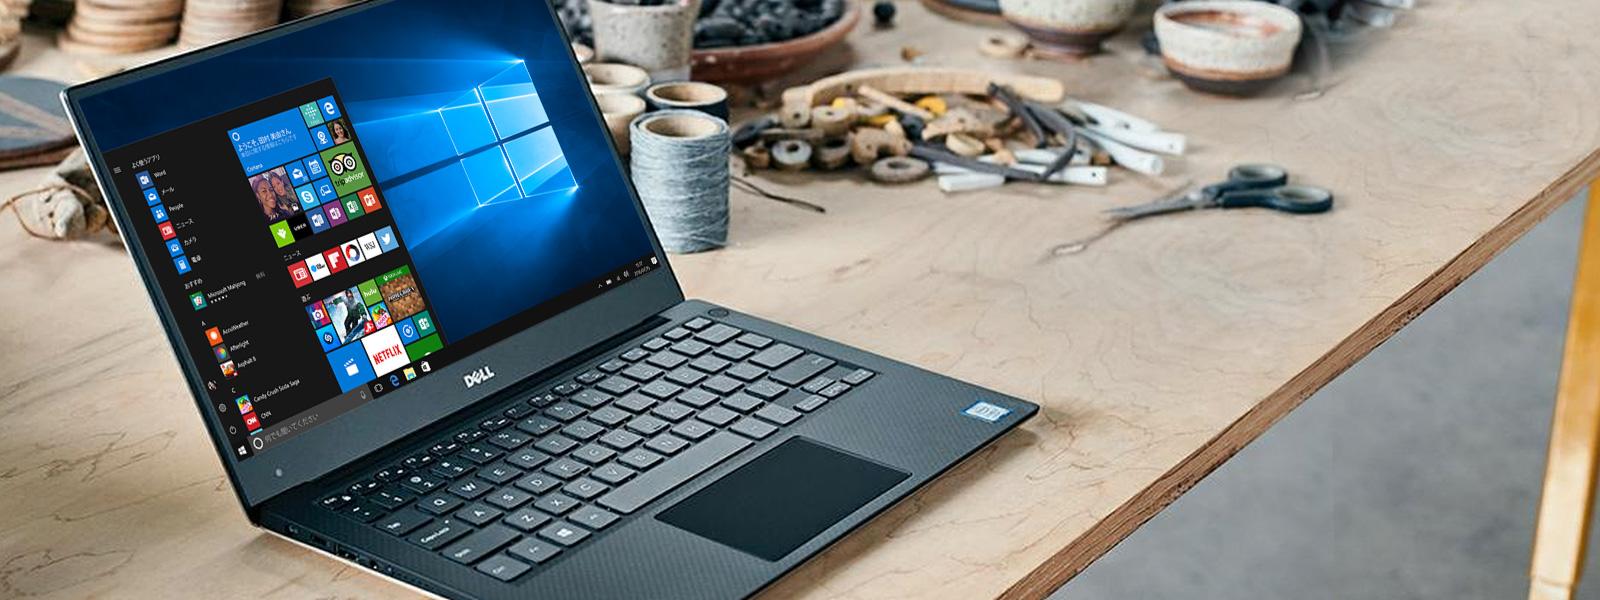 Windows 10 スタート画面を表示した Dell XPS 13